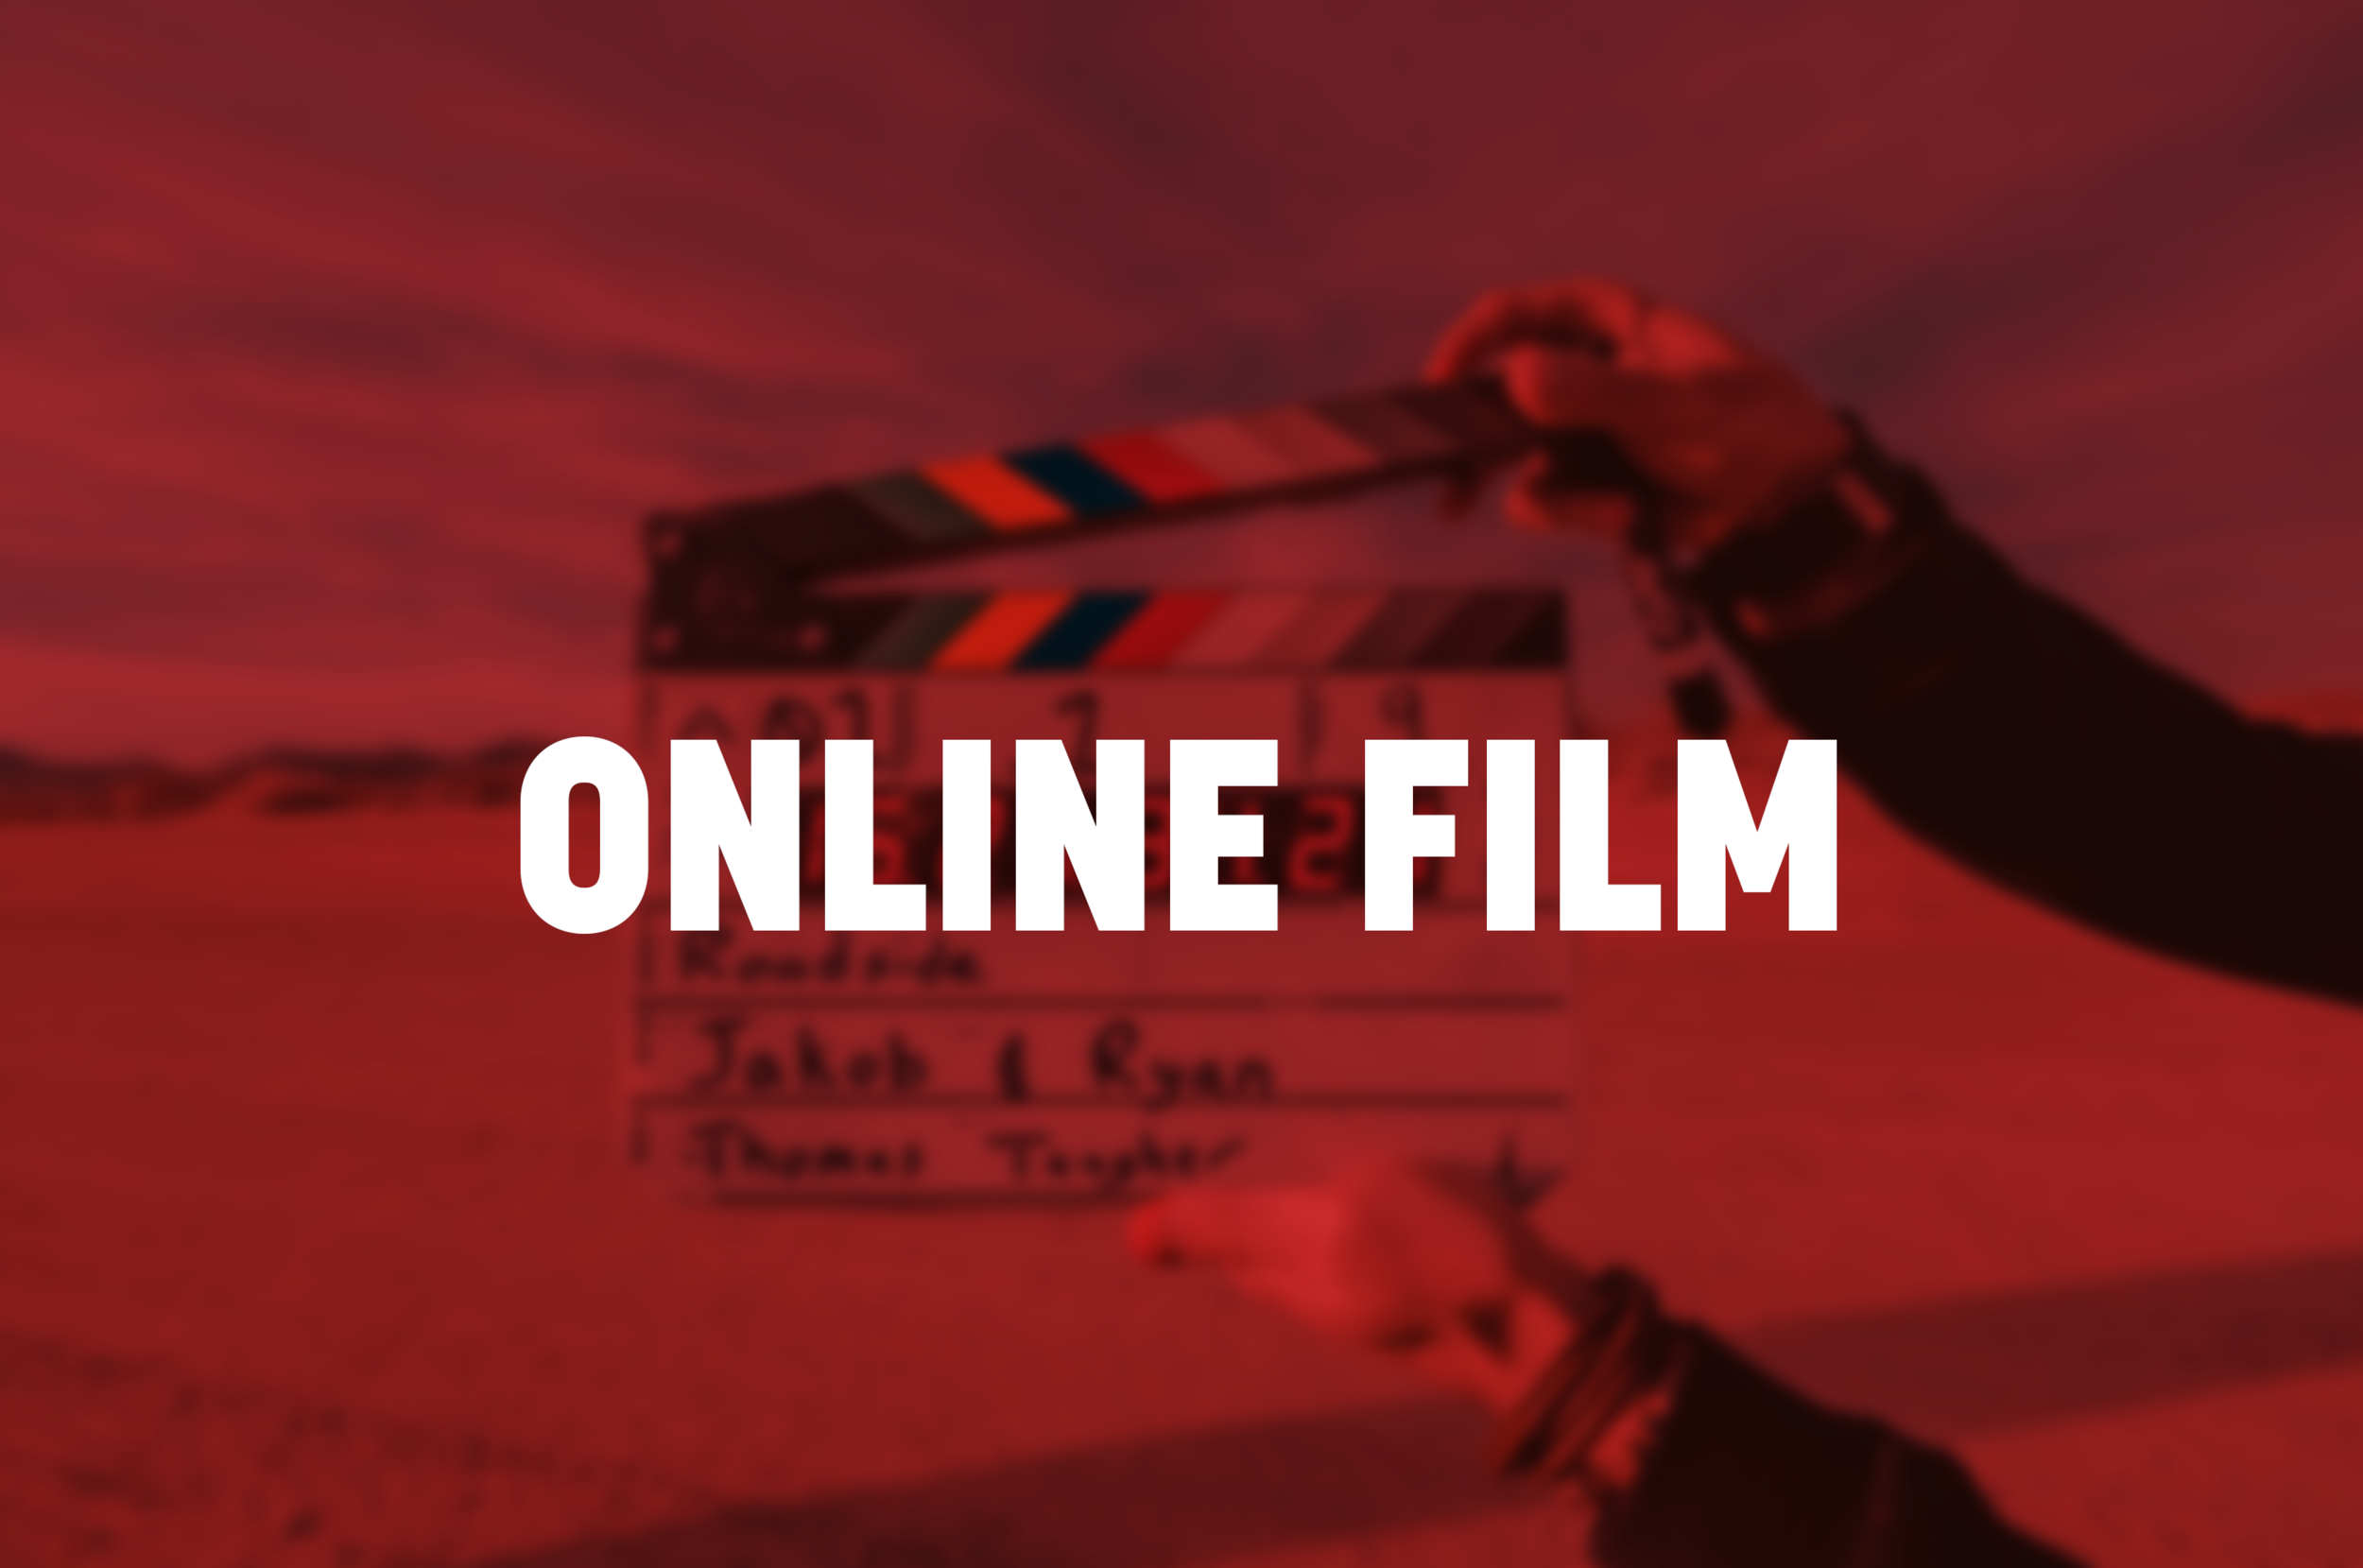 Online Film.png